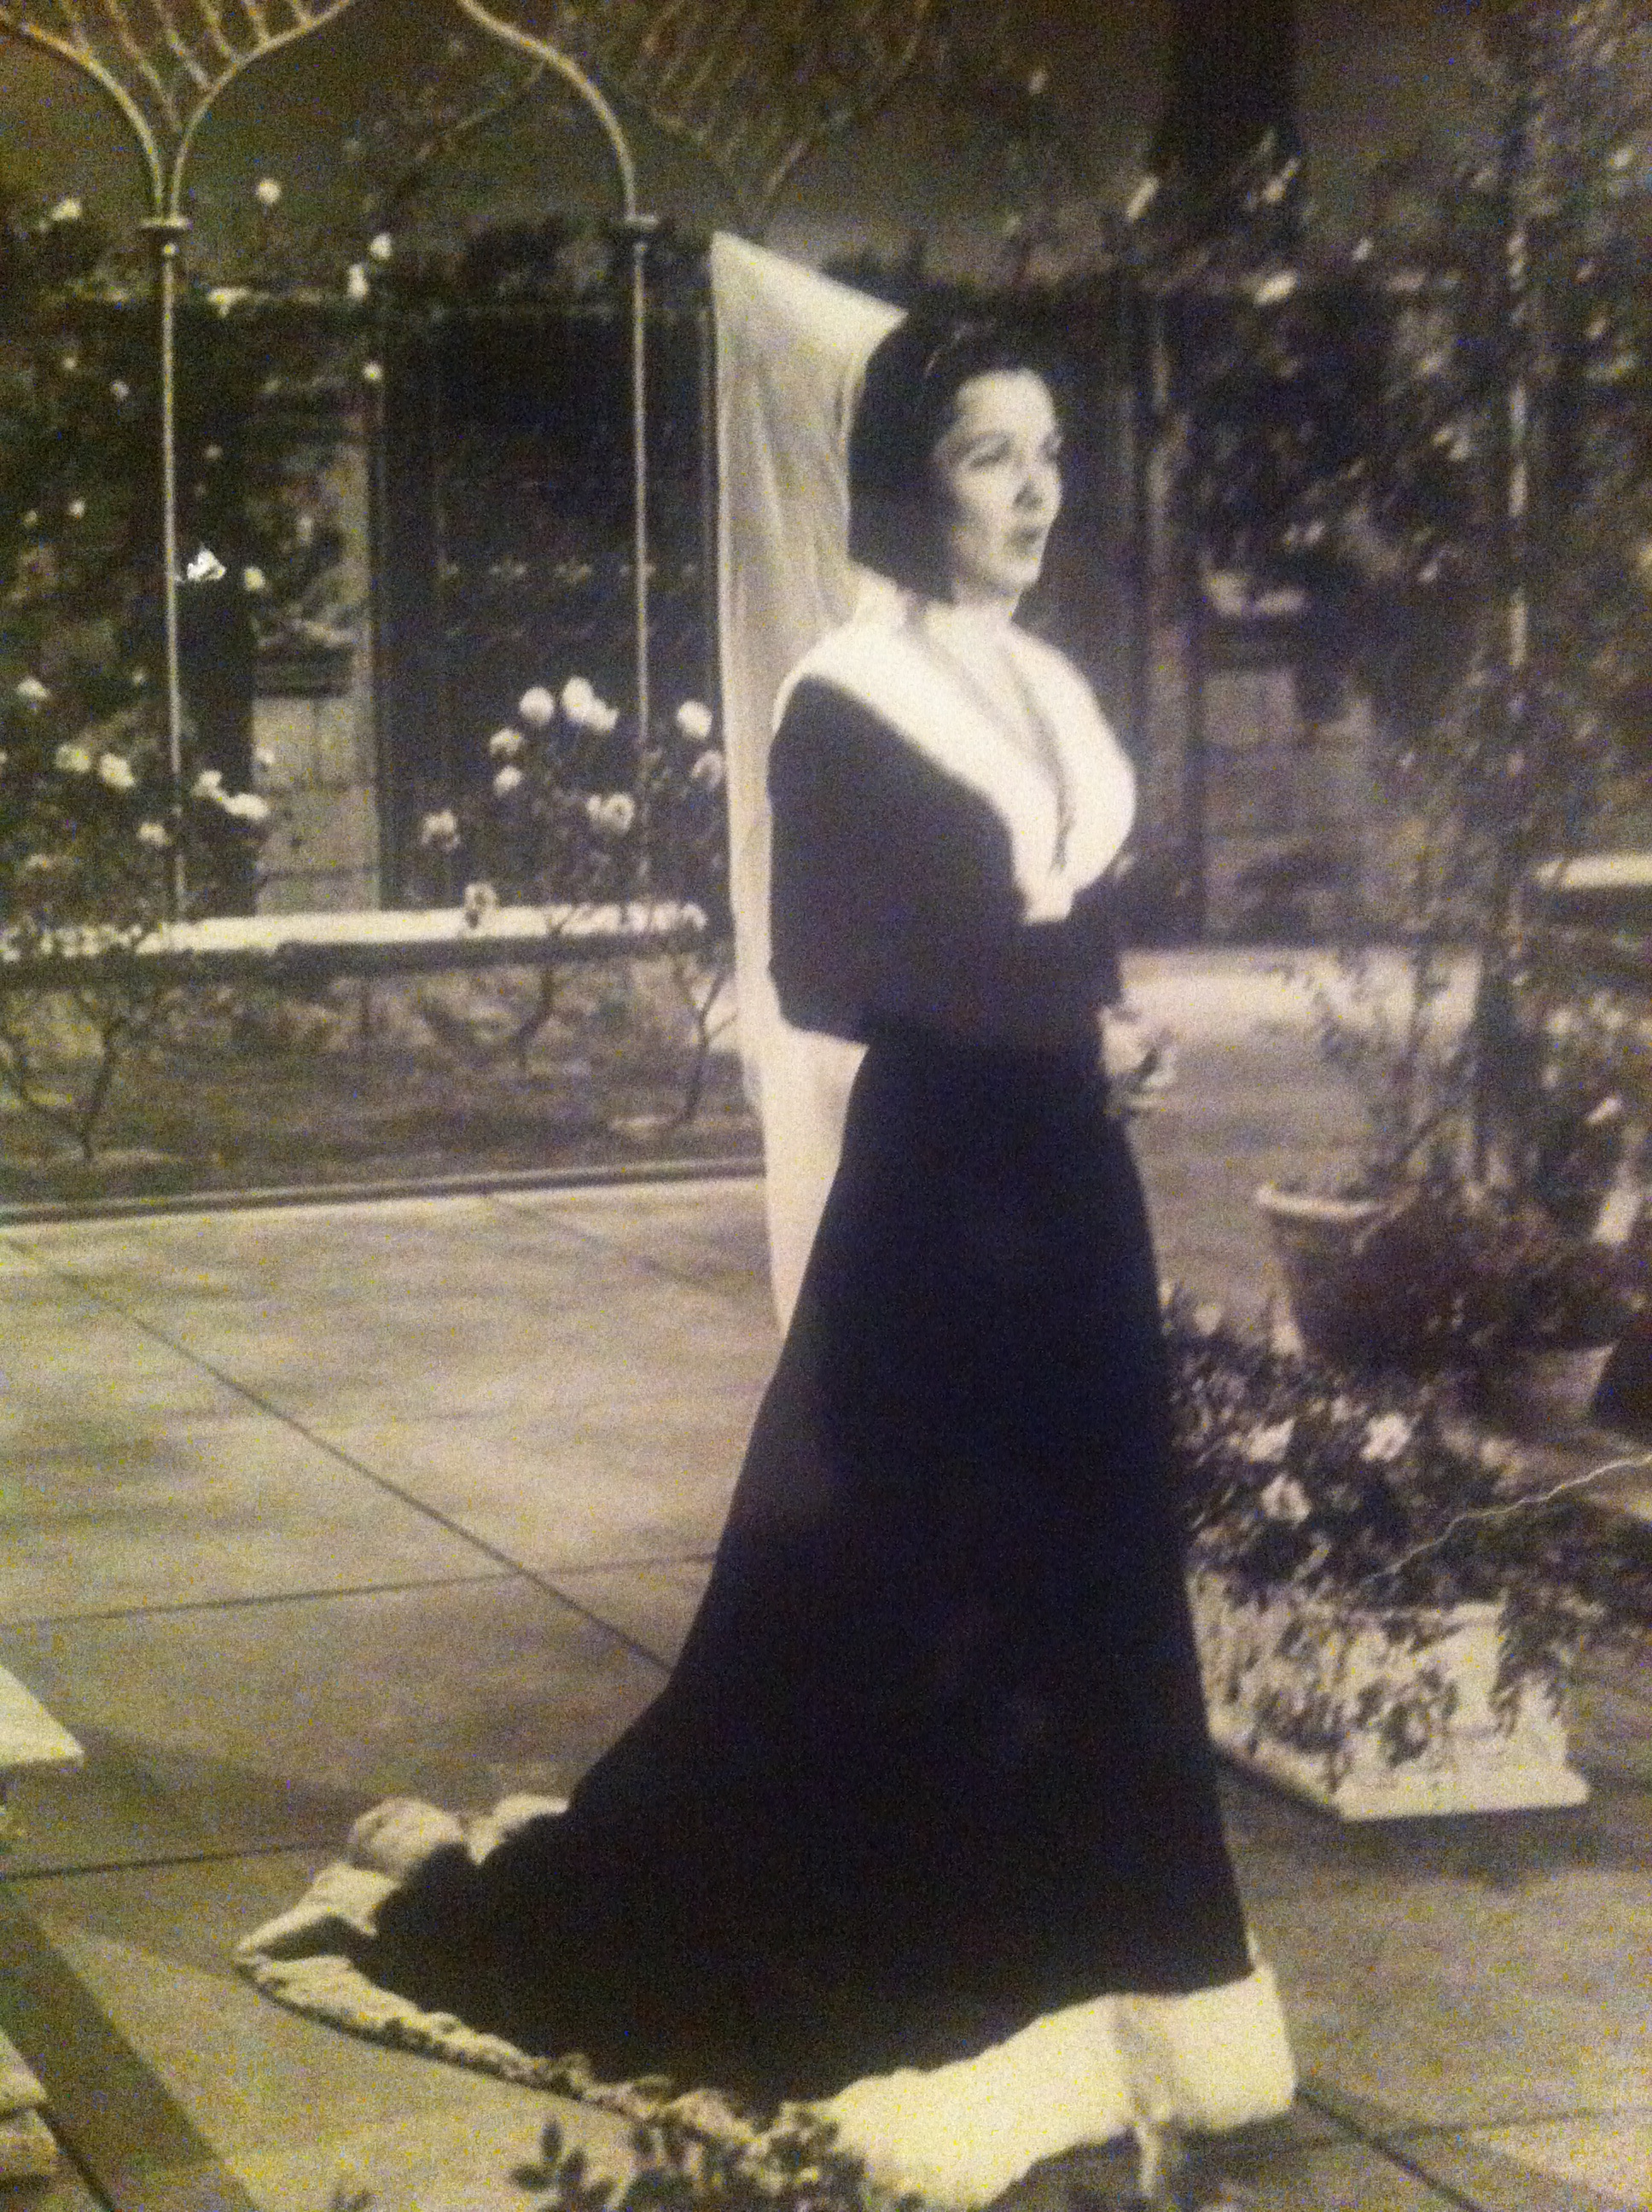 Kathryn Grayson in The Vagabond King (1956)